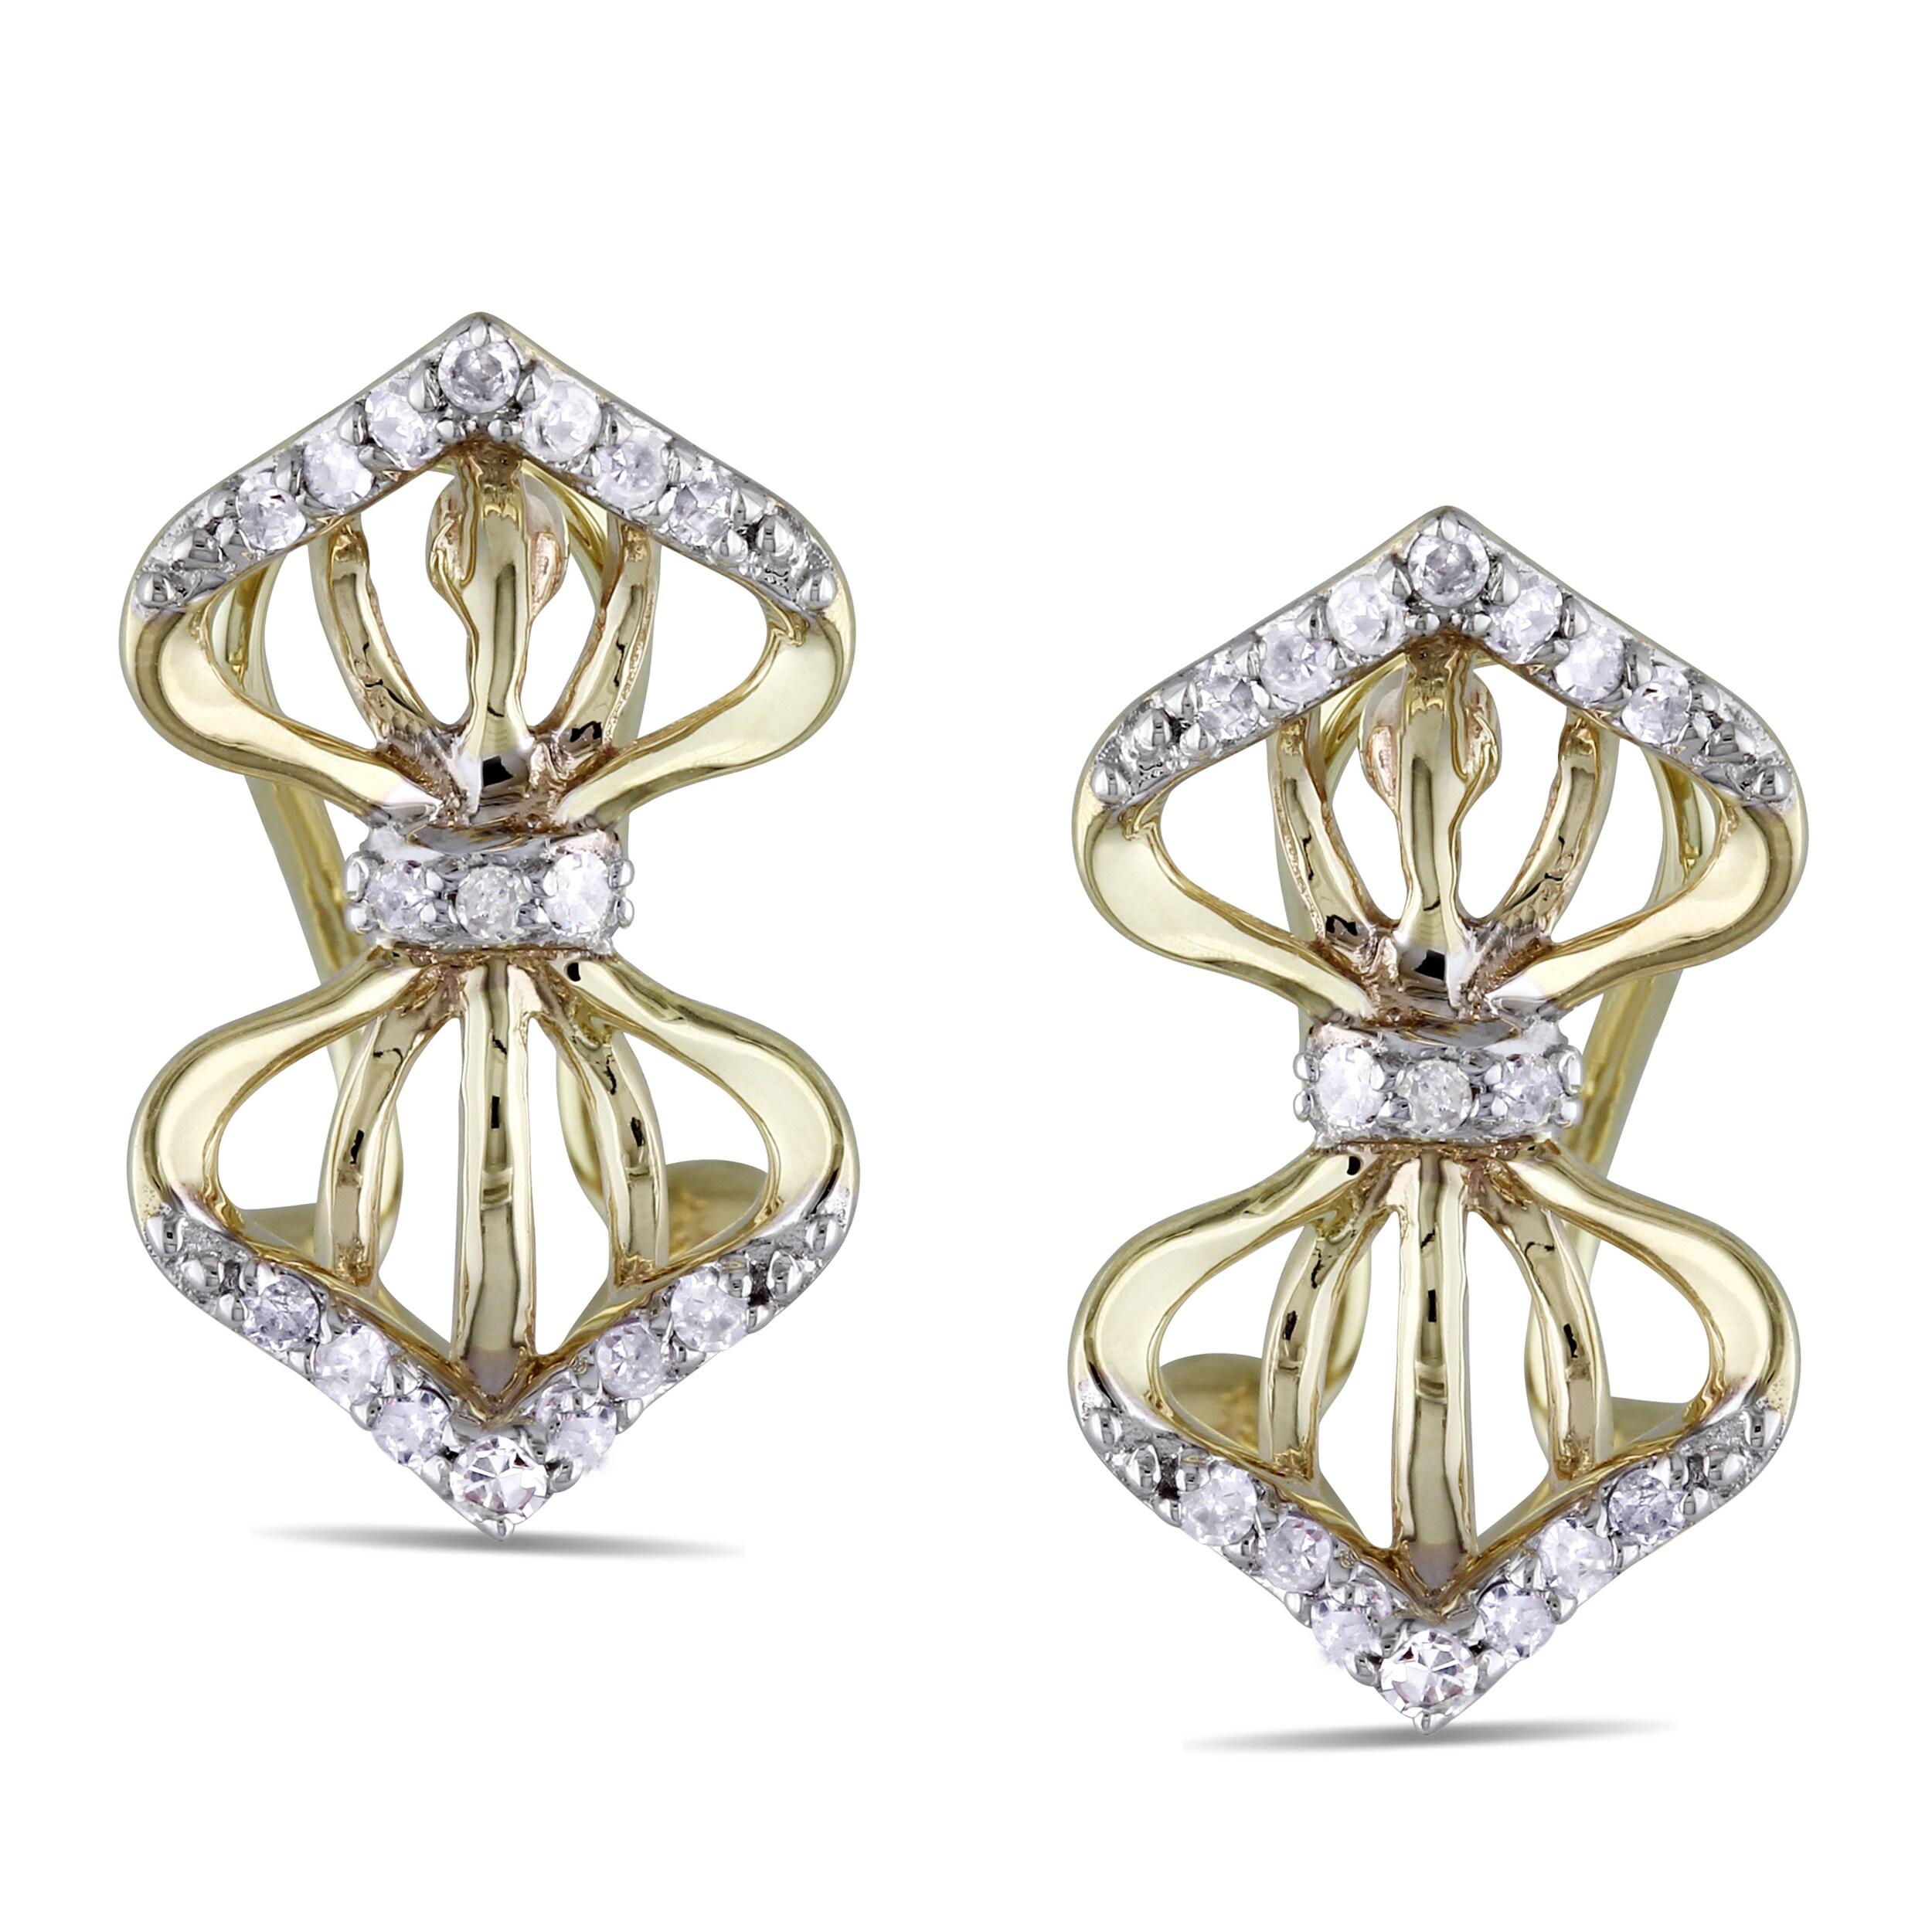 Miadora 14k Yellow Gold 1/6ct TDW Diamond Leverback Earrings (H-I, I2-I3)